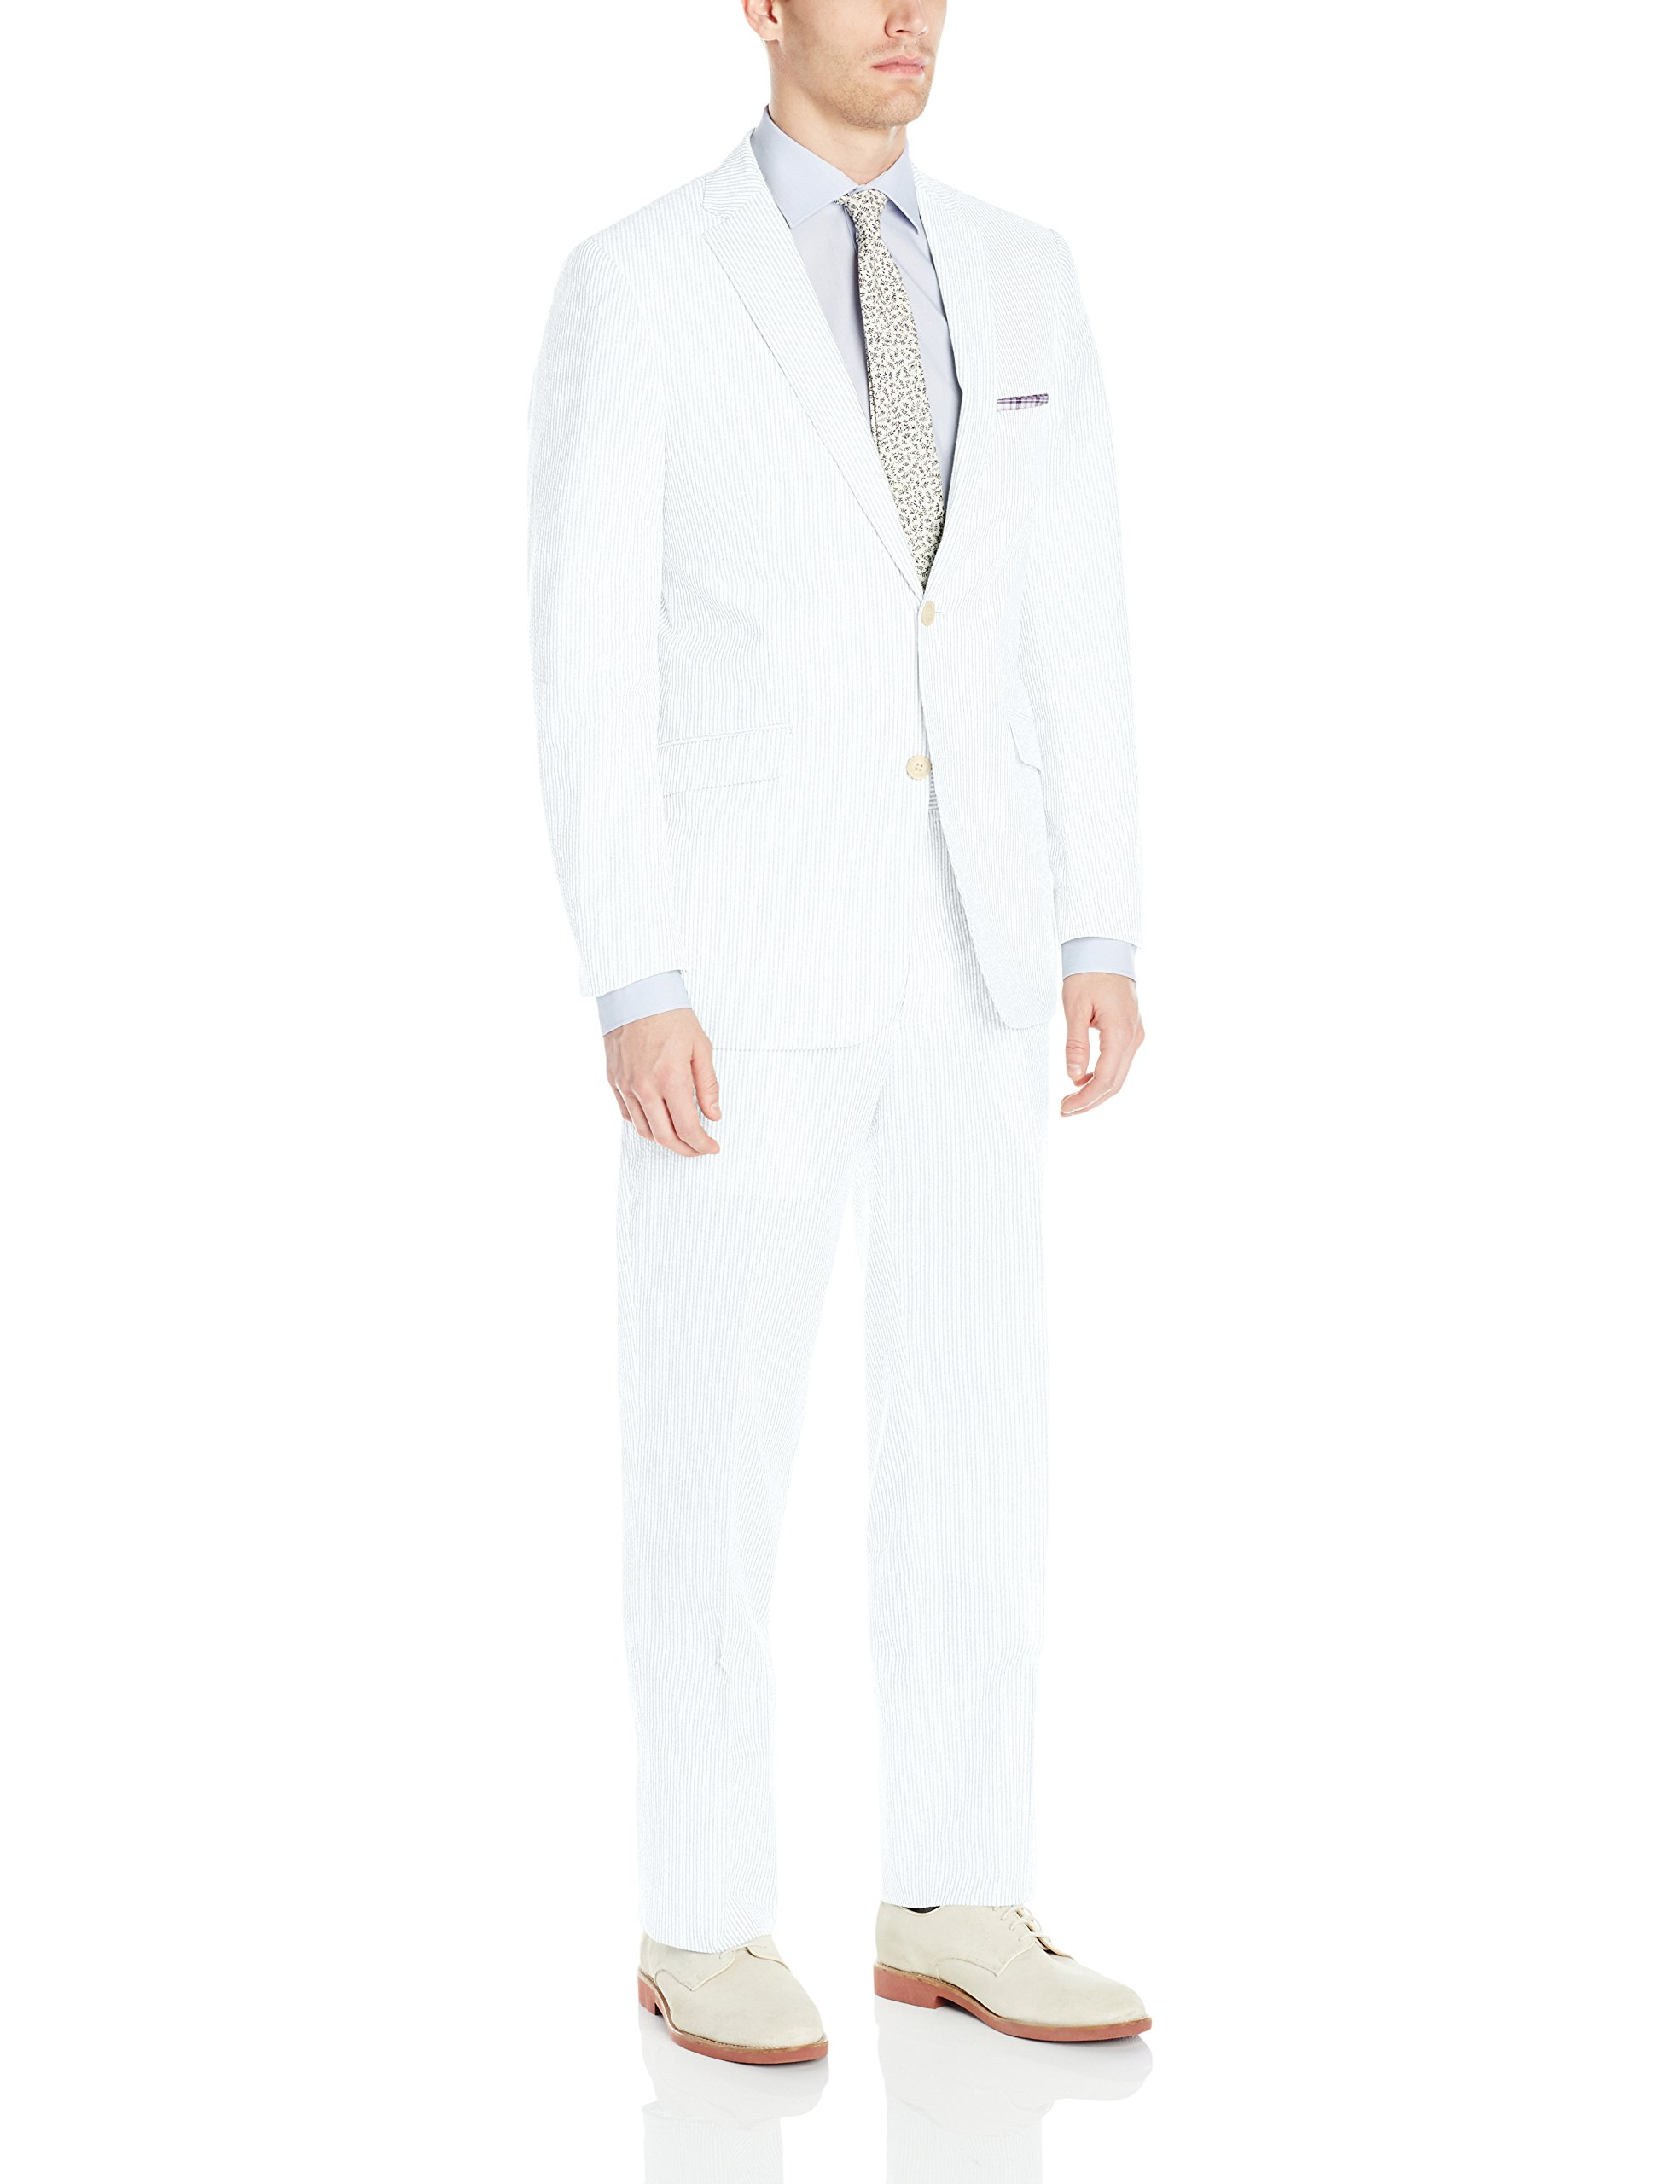 U.S. Polo Assn. Men's Seersucker Nested Suit, White, 44 Regular